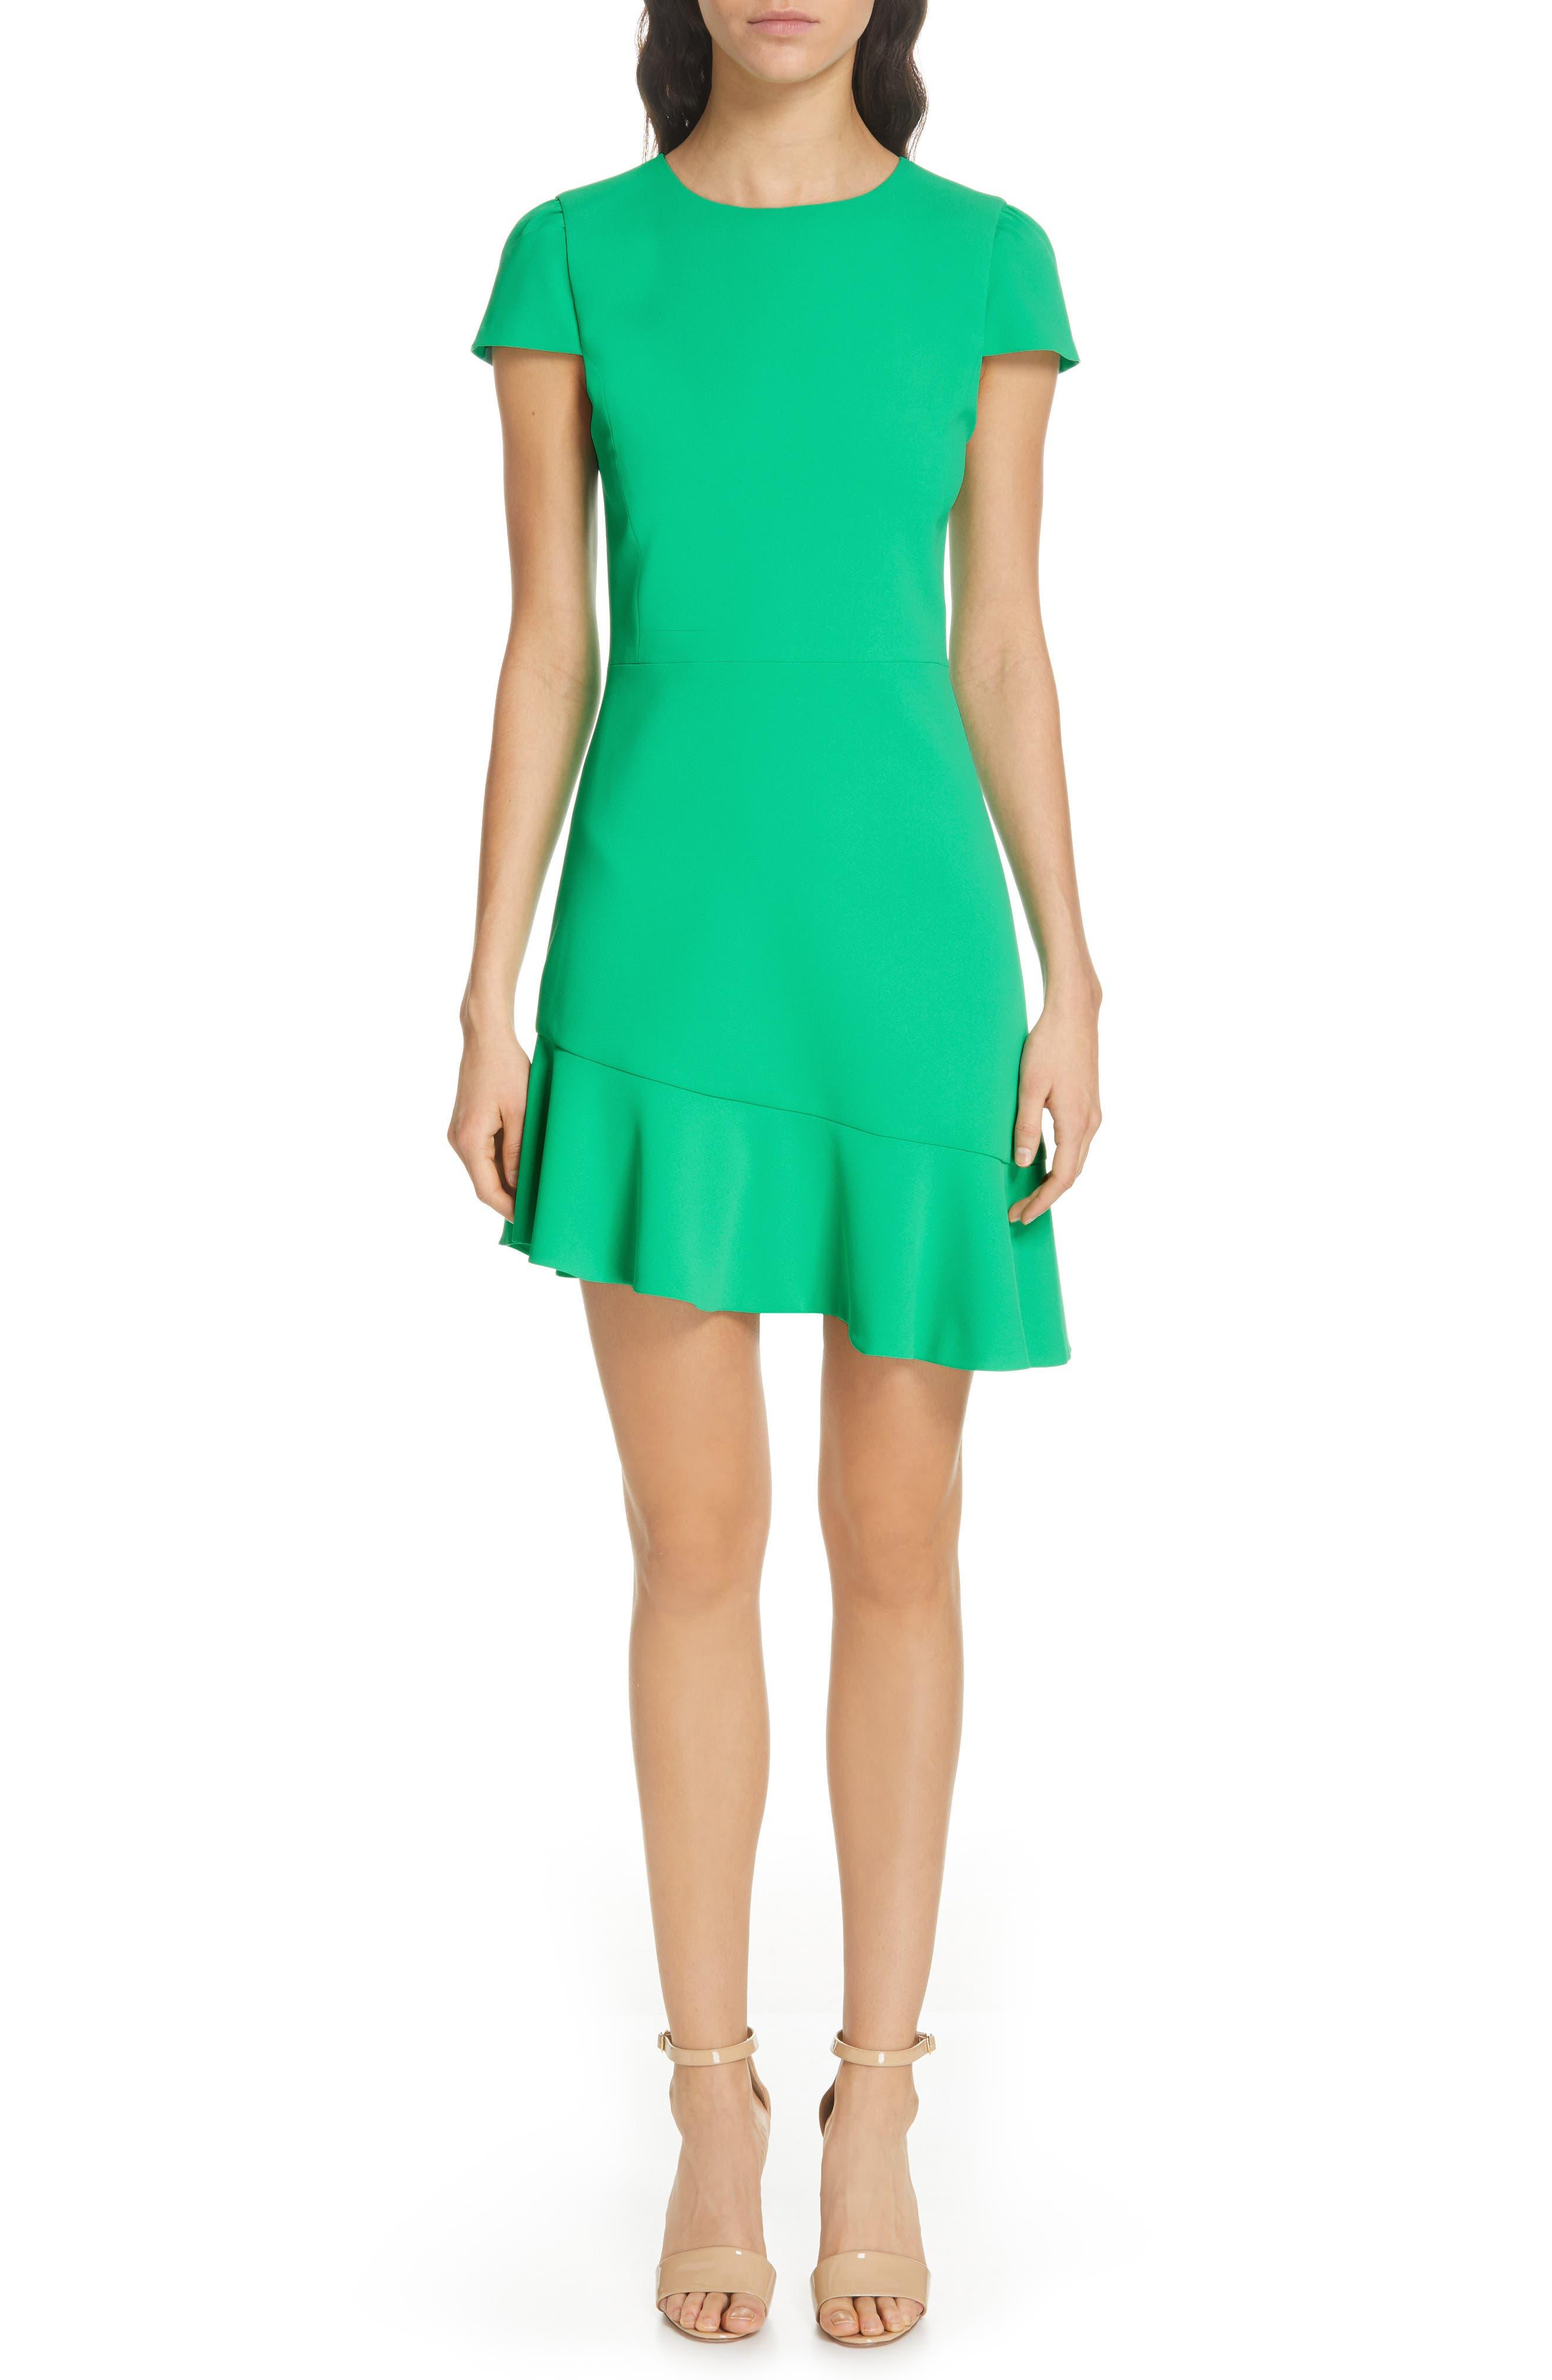 Alice + Olivia Fable Asymmetrical Ruffle Dress, Green